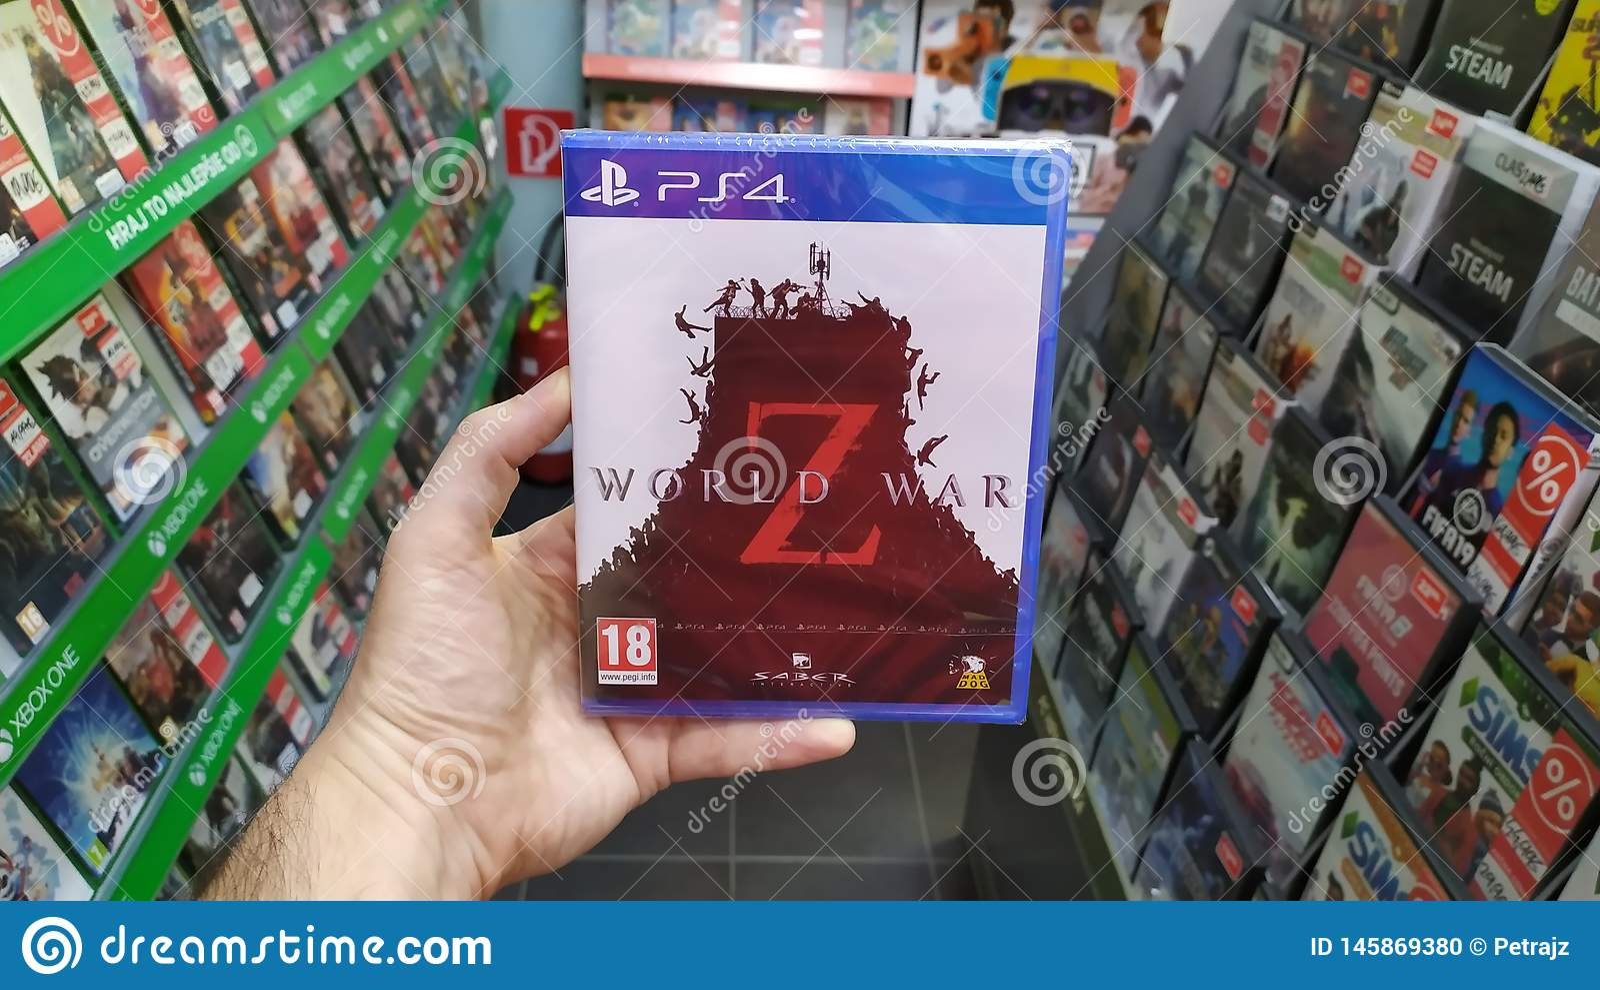 Man Holding World War Z Videogame On Sony Playstation 4